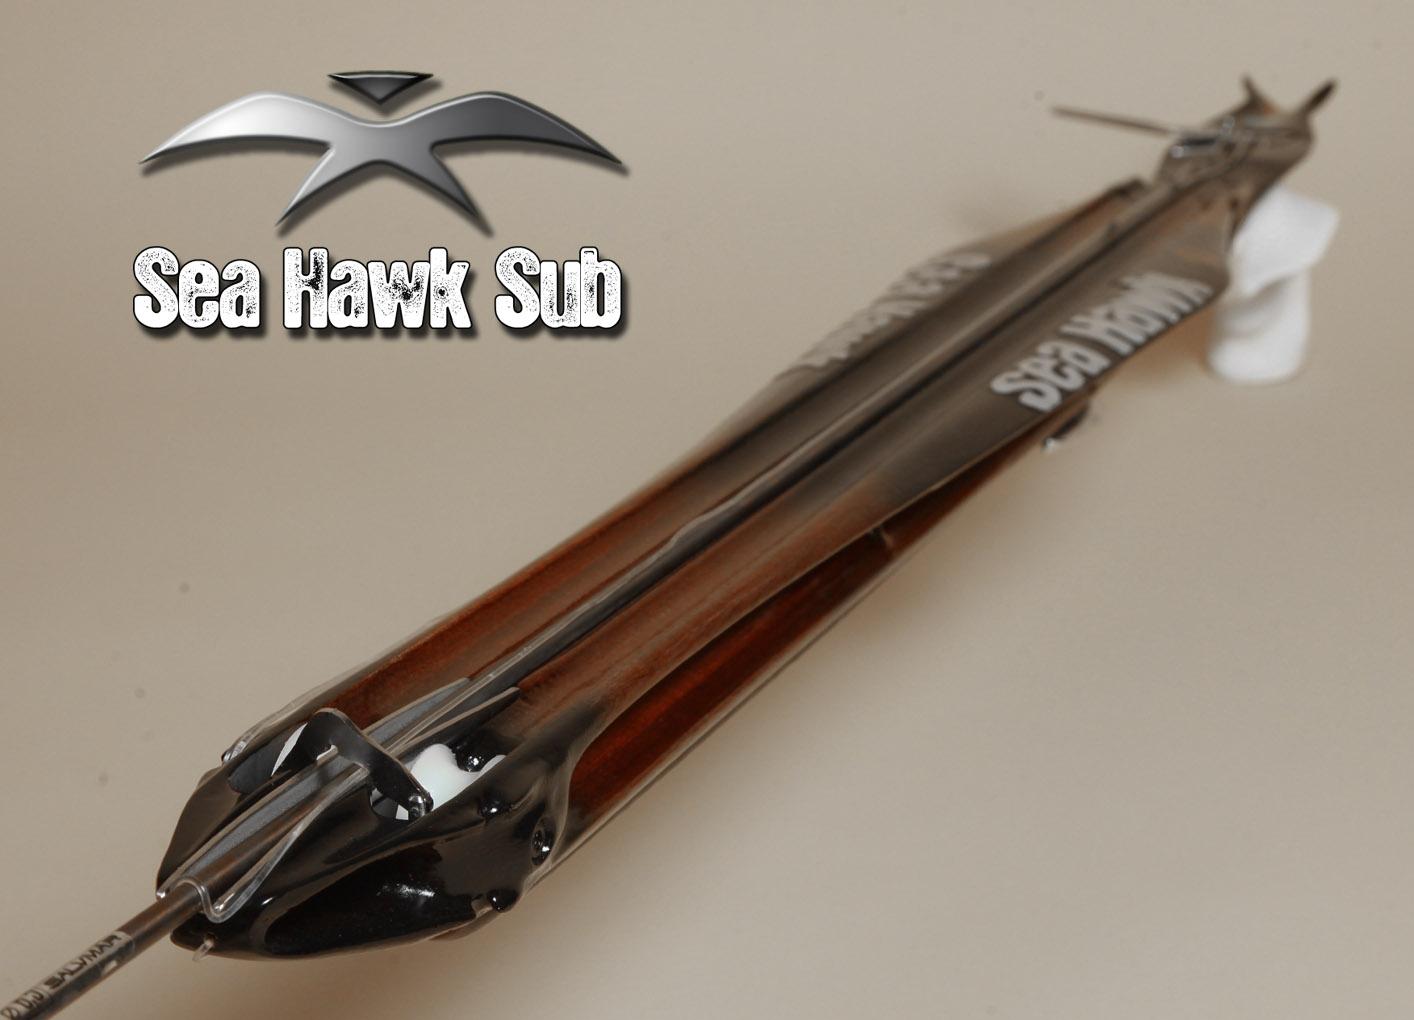 Seahawksub 001